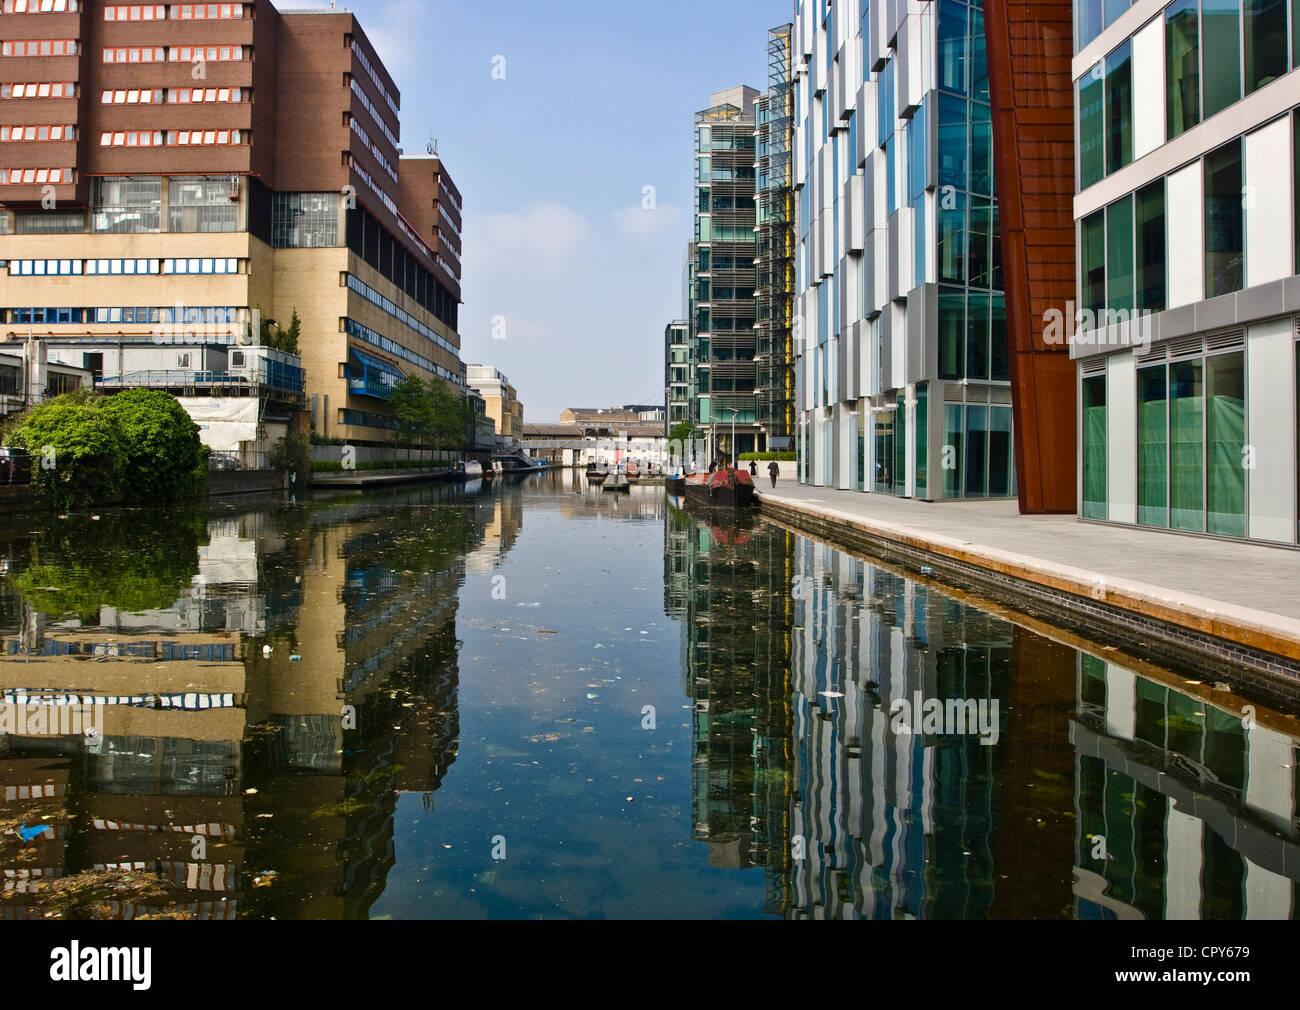 Modern Architecture London England modern architecture on regent's canal at paddington basin london